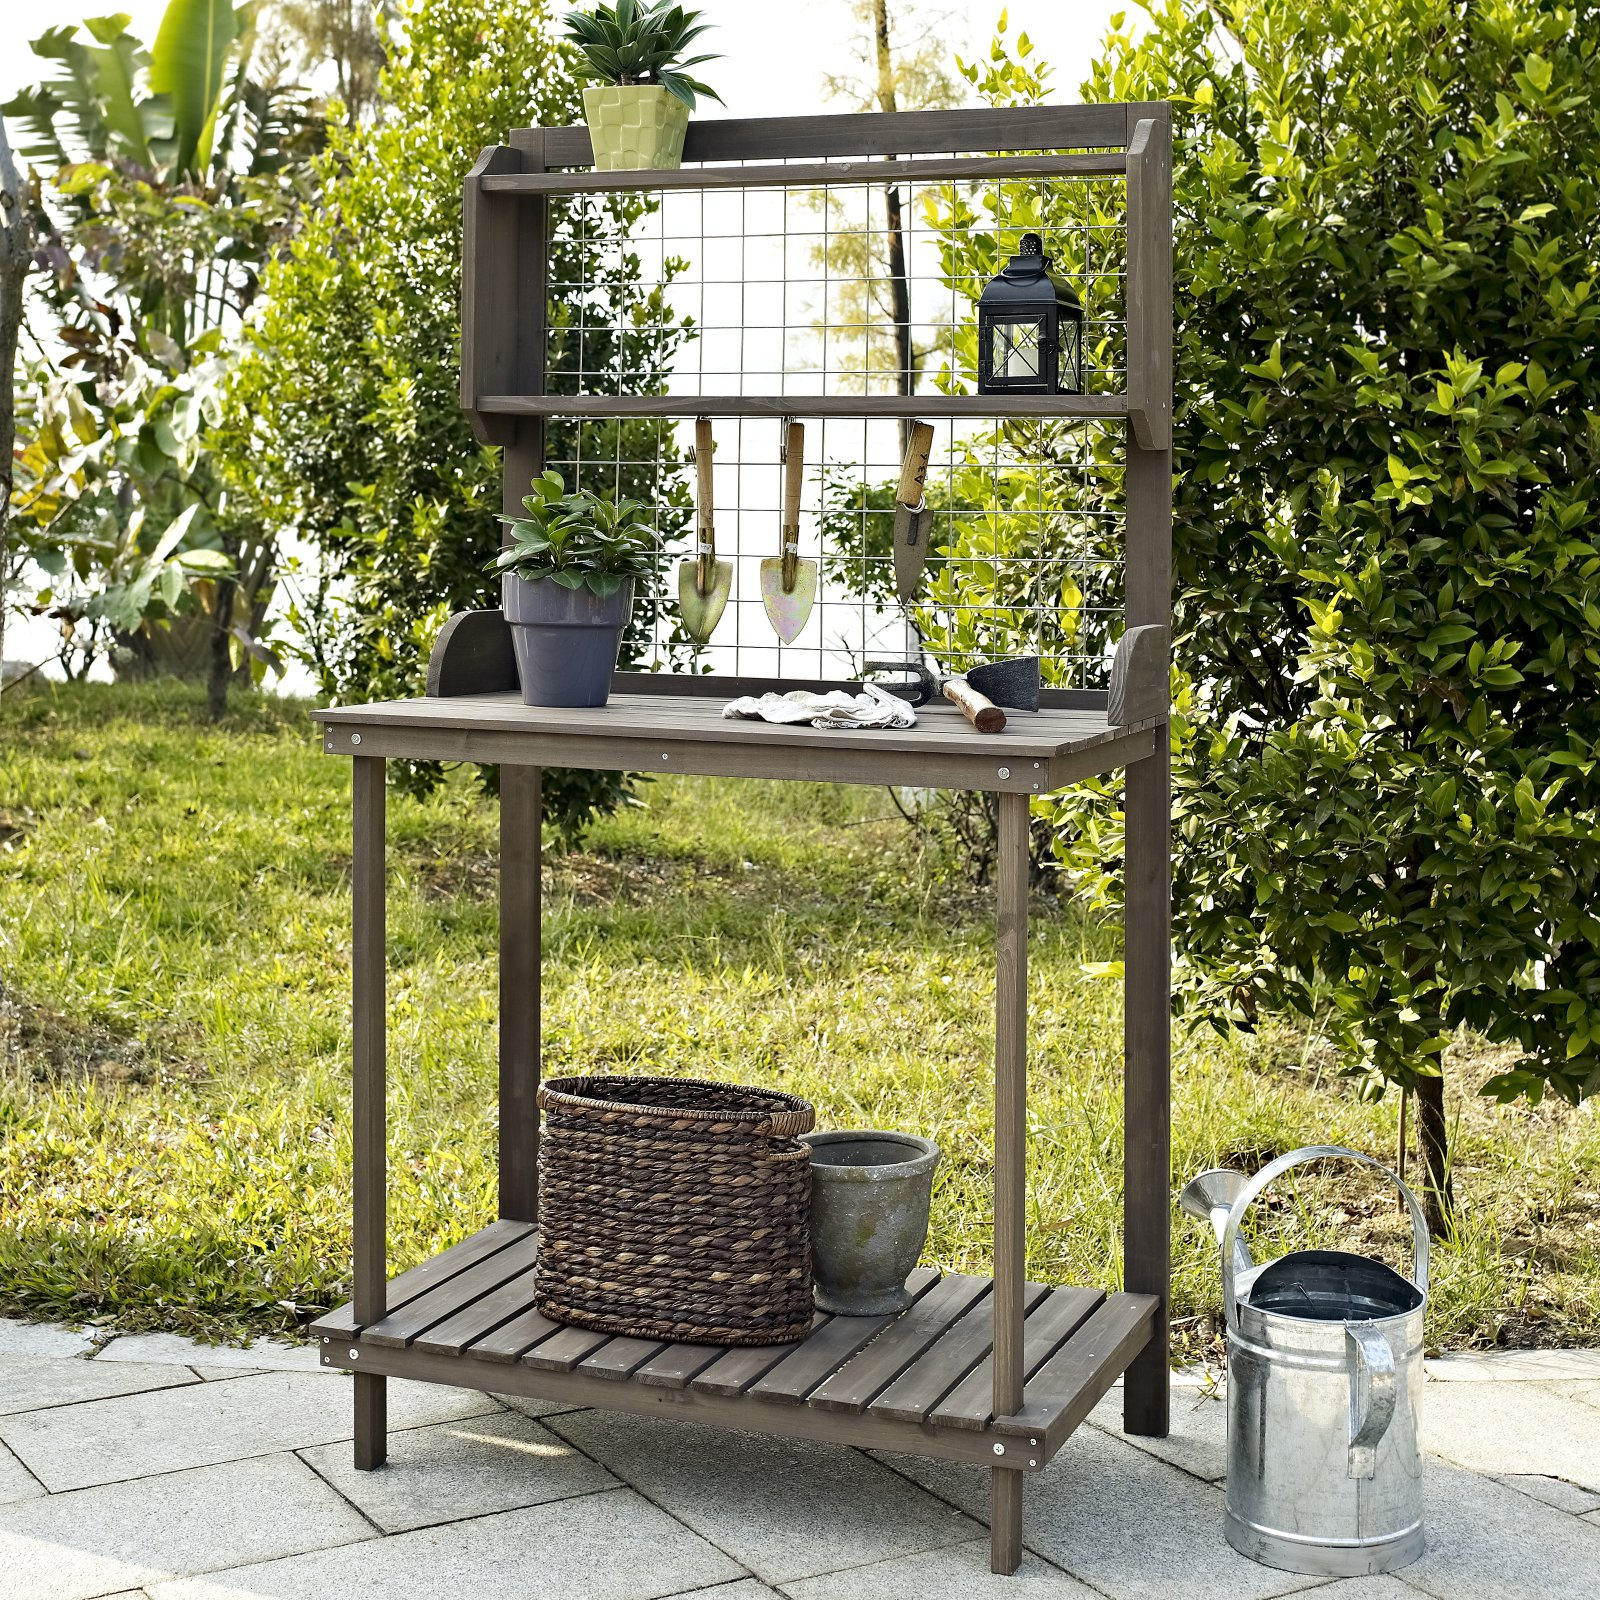 Superb Details About Potting Table Bench Home Outdoor Garden Backyard Plant Tool Wood Work Furniture Frankydiablos Diy Chair Ideas Frankydiabloscom